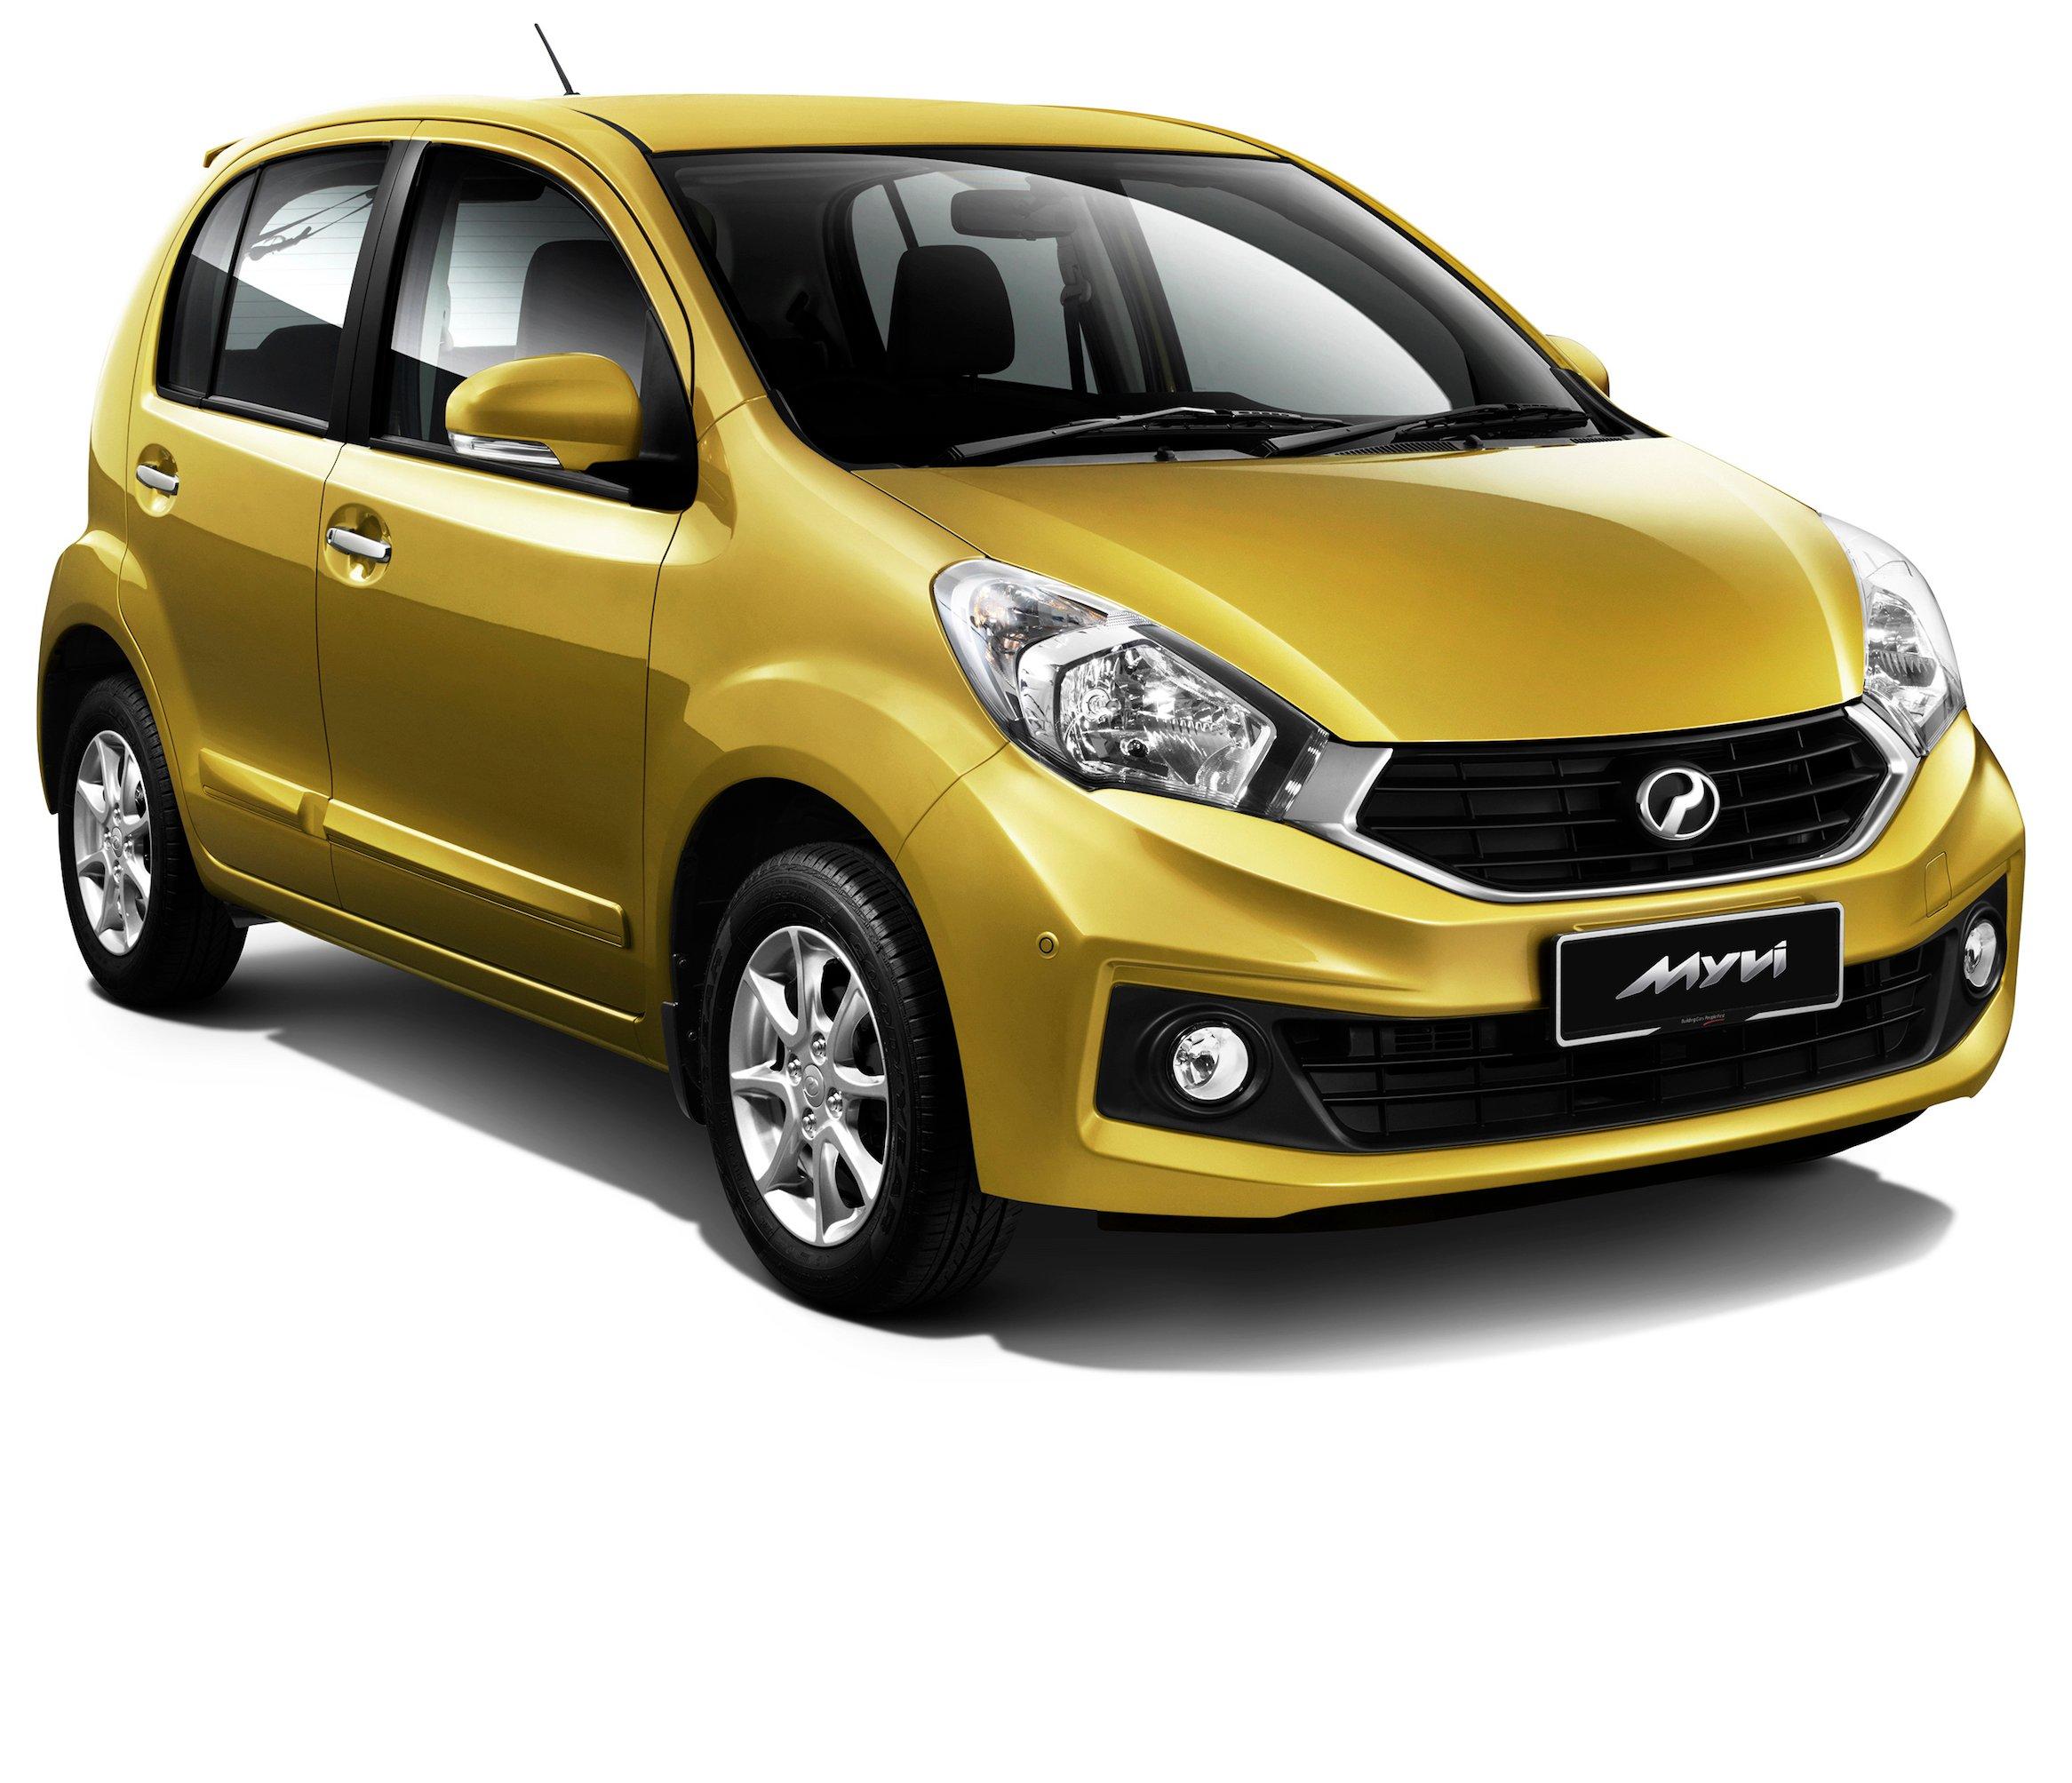 Myvi Se 1.5 >> 2015 Perodua Myvi facelift launched